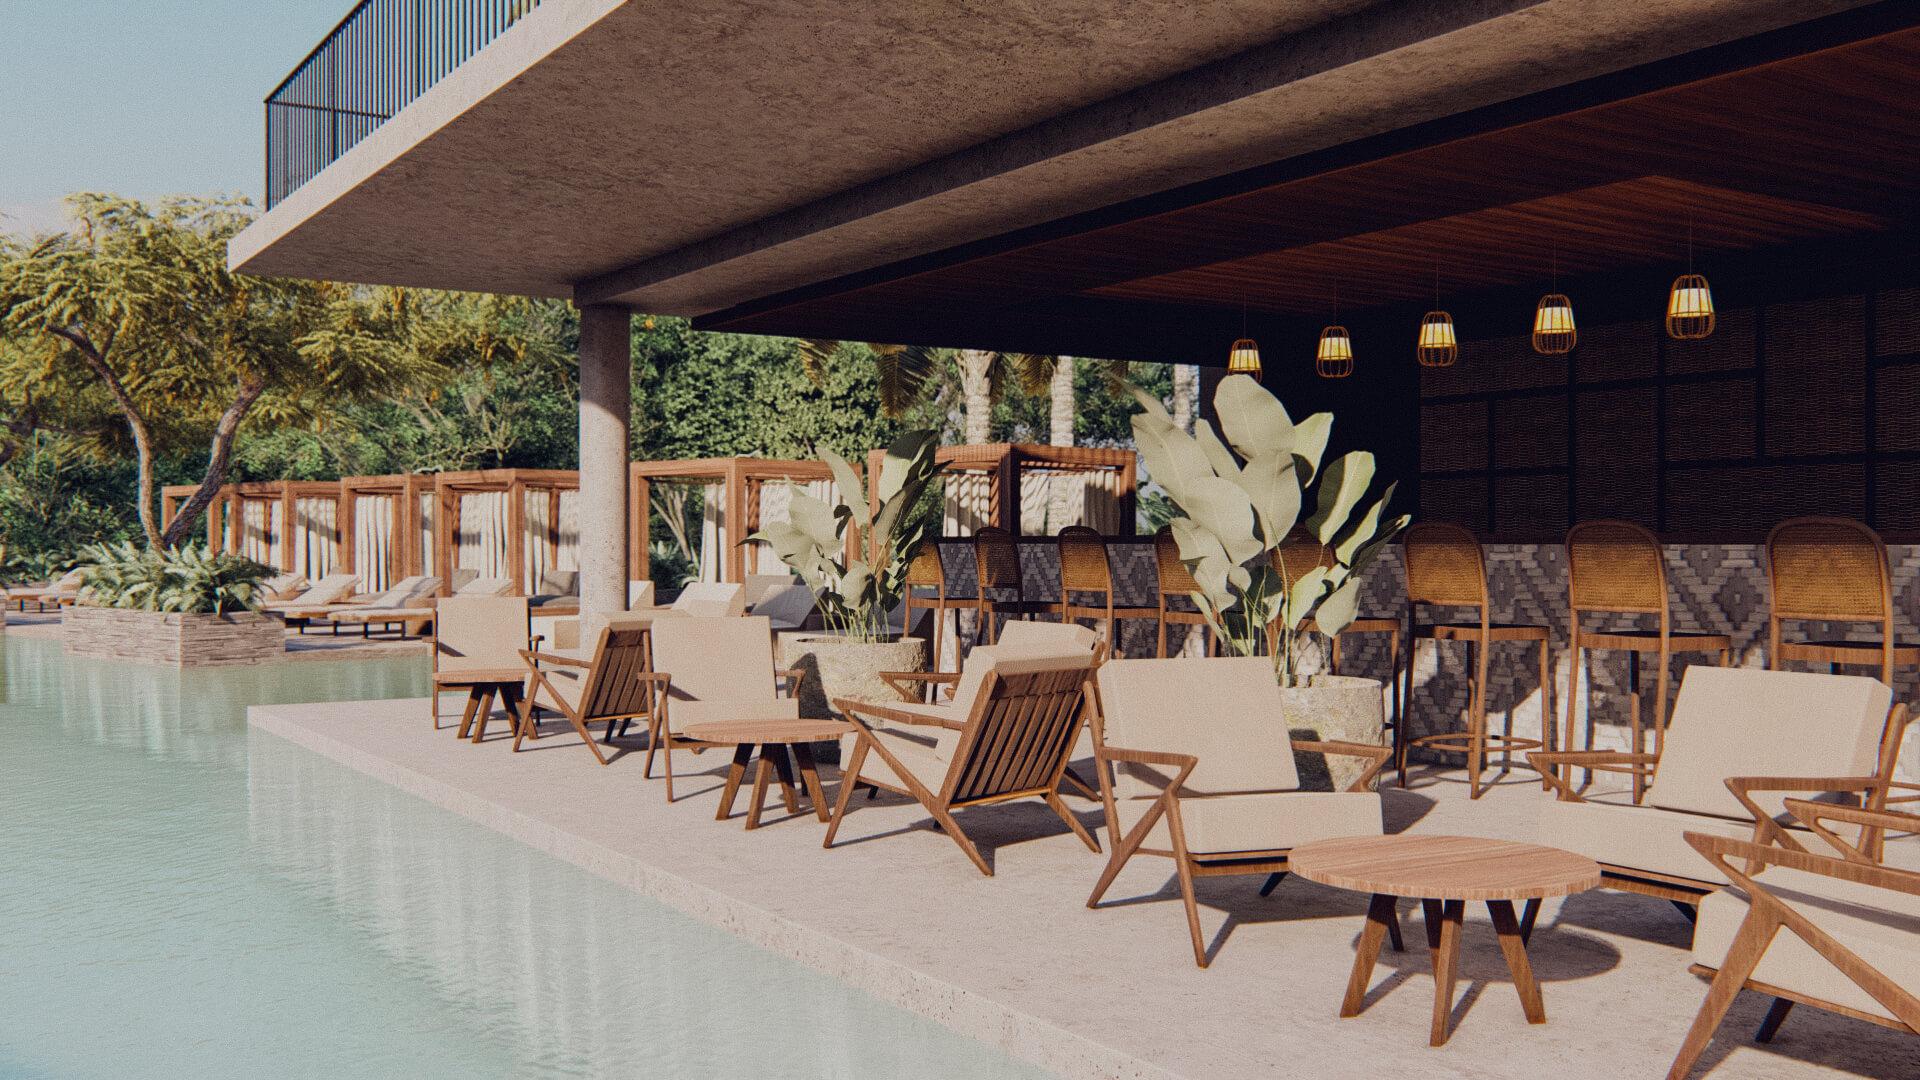 Resort Hotel Swimming Pool Bar Lombok Bali Architect 01